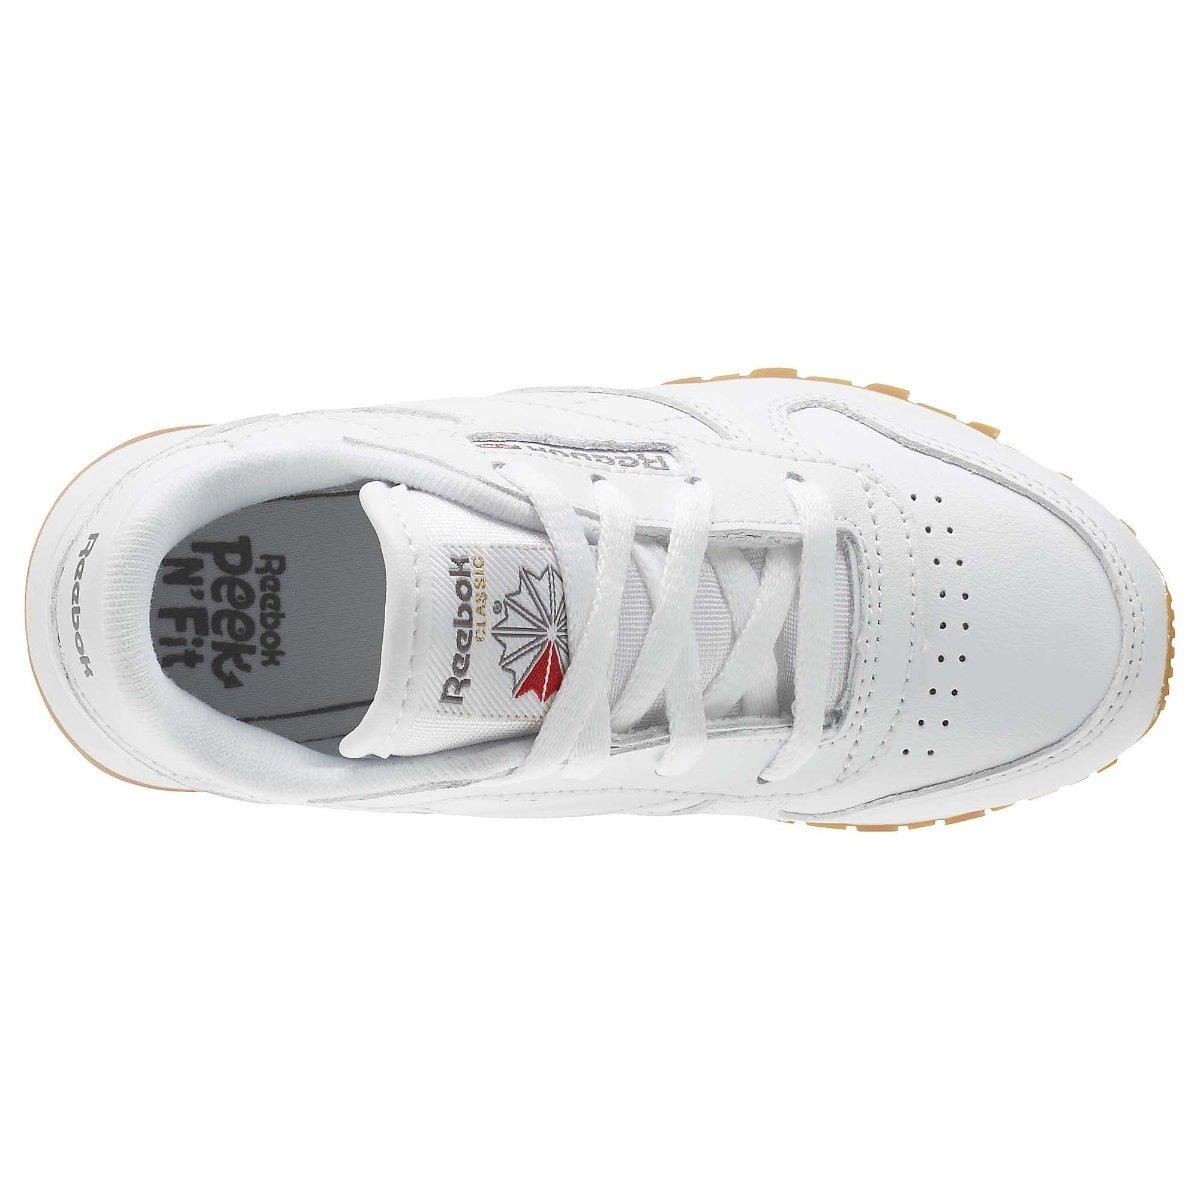 9c5513679ea tenis reebok classic leather blanco infantil niño 2018. Cargando zoom... tenis  reebok niño. Cargando zoom.